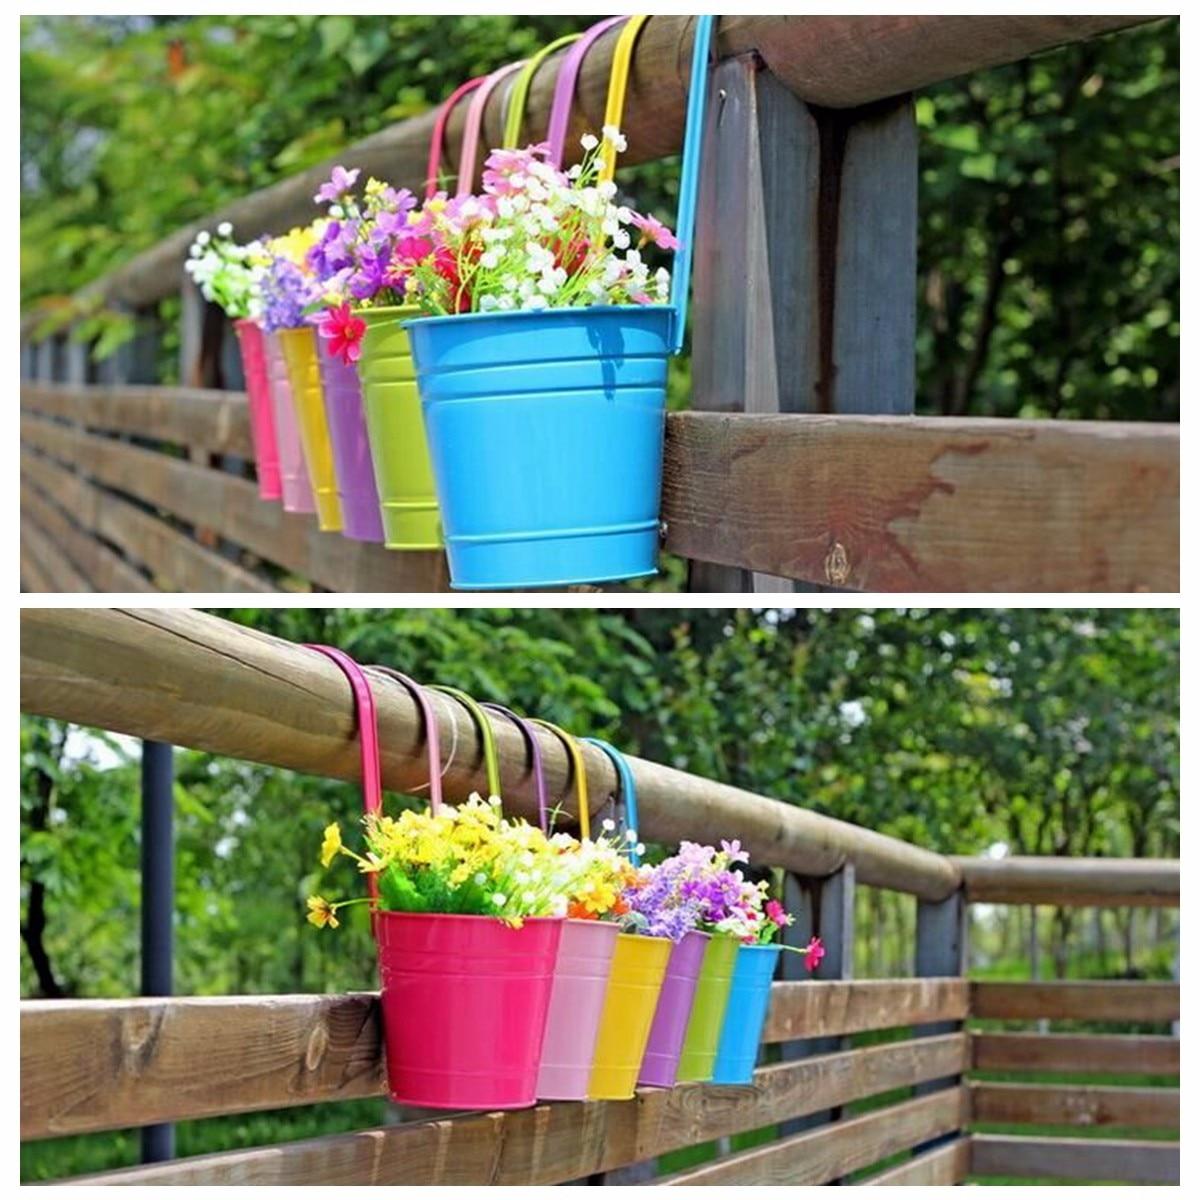 10pcs Multi Color Metal Iron Flower Pot Hanging Balcony